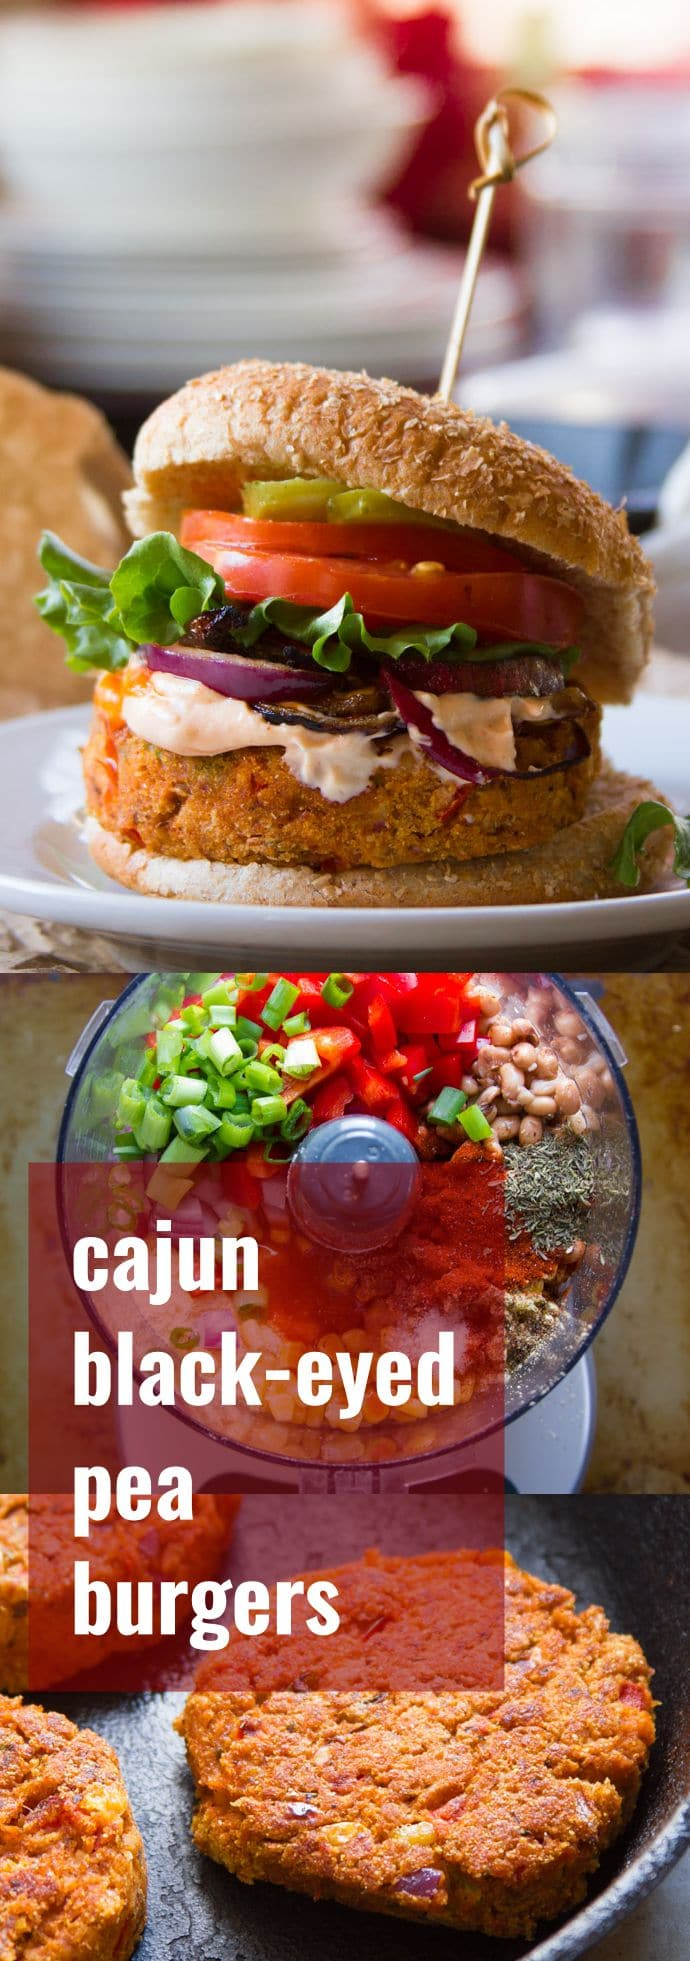 Cajun Black-Eyed Pea Burgers